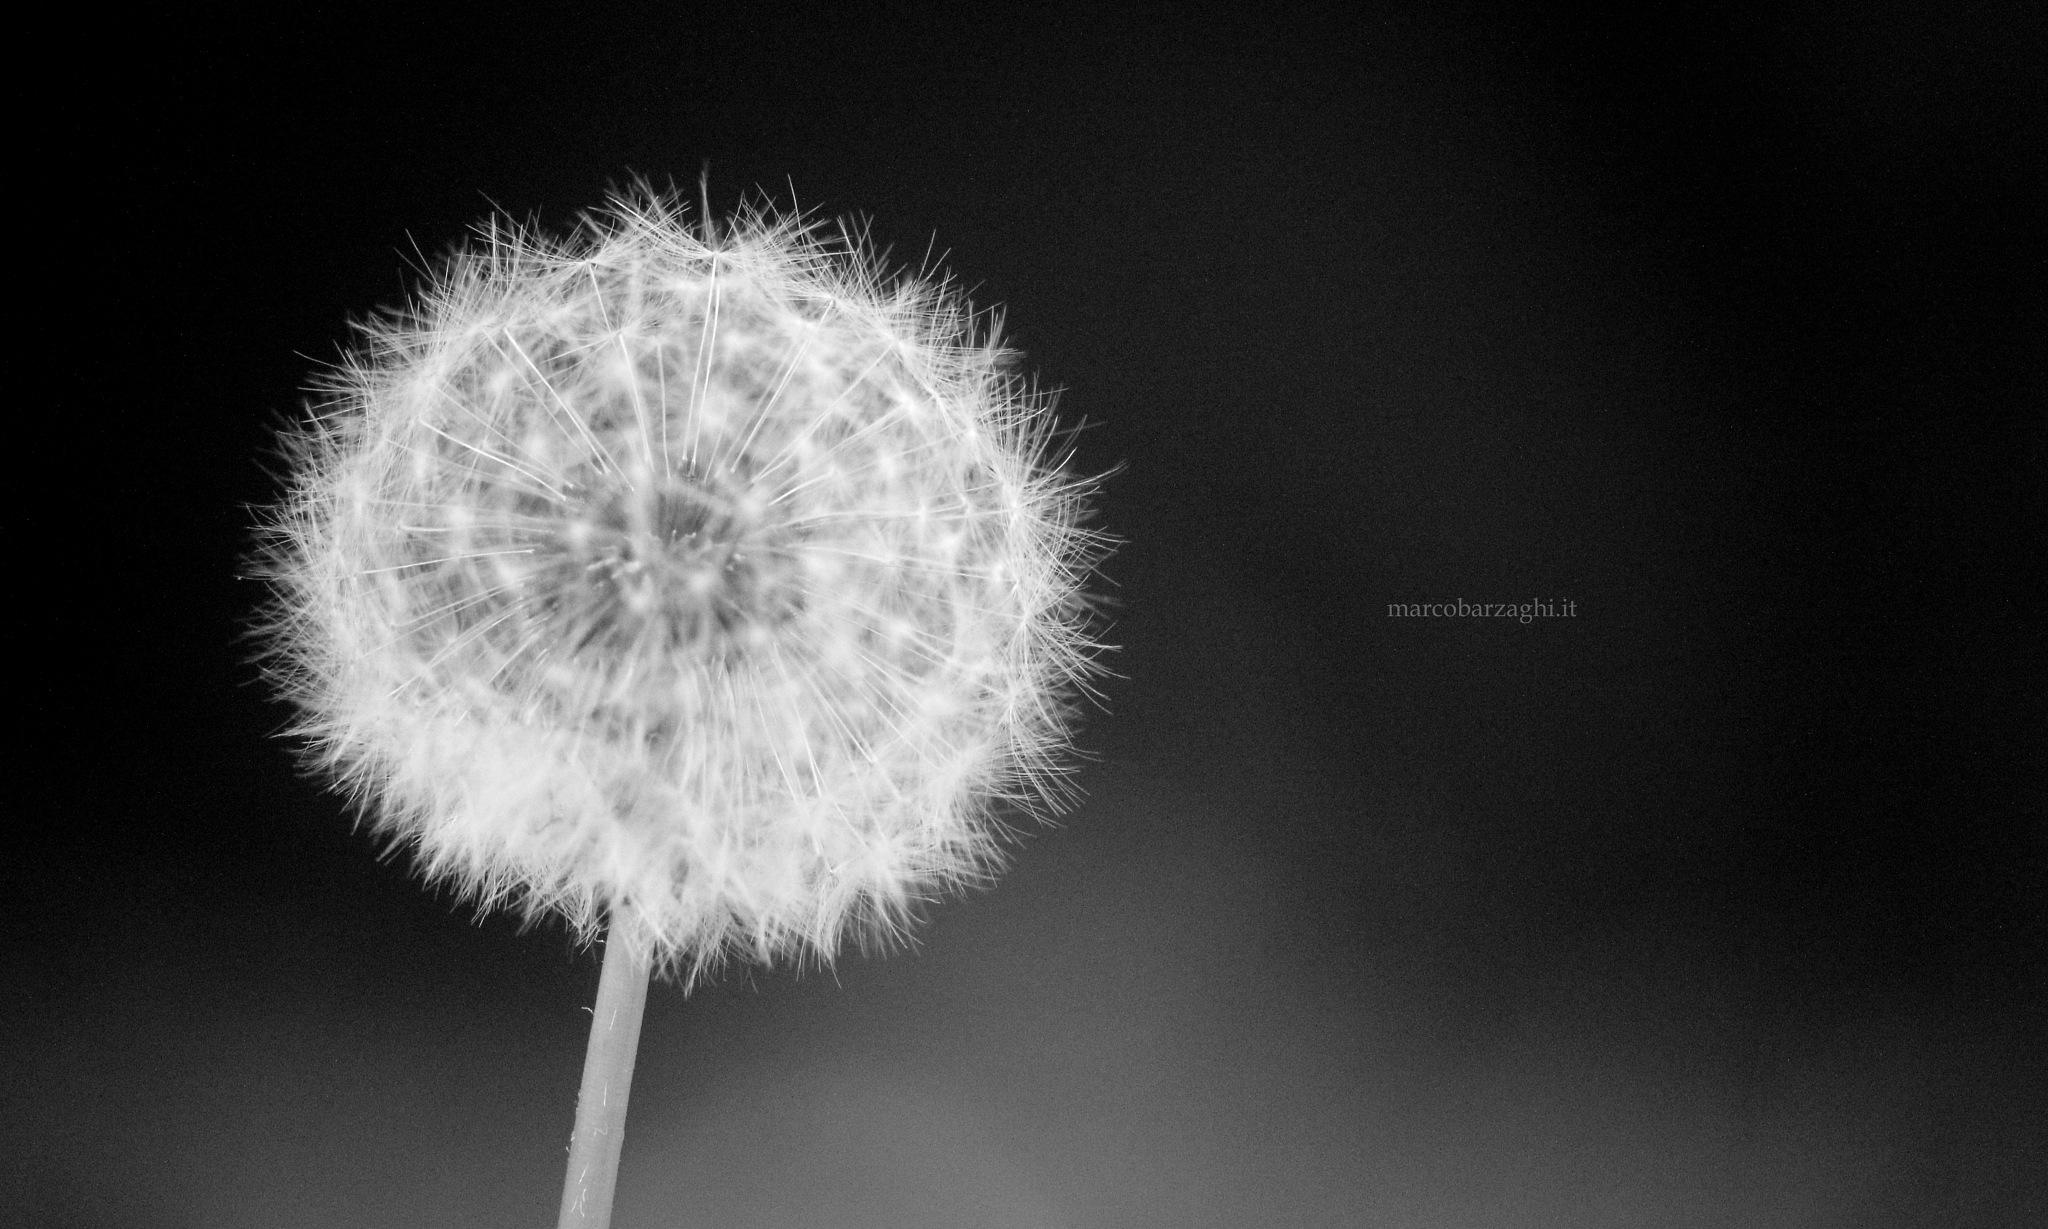 Garden - Dandelion (b/w) by Marco Barzaghi